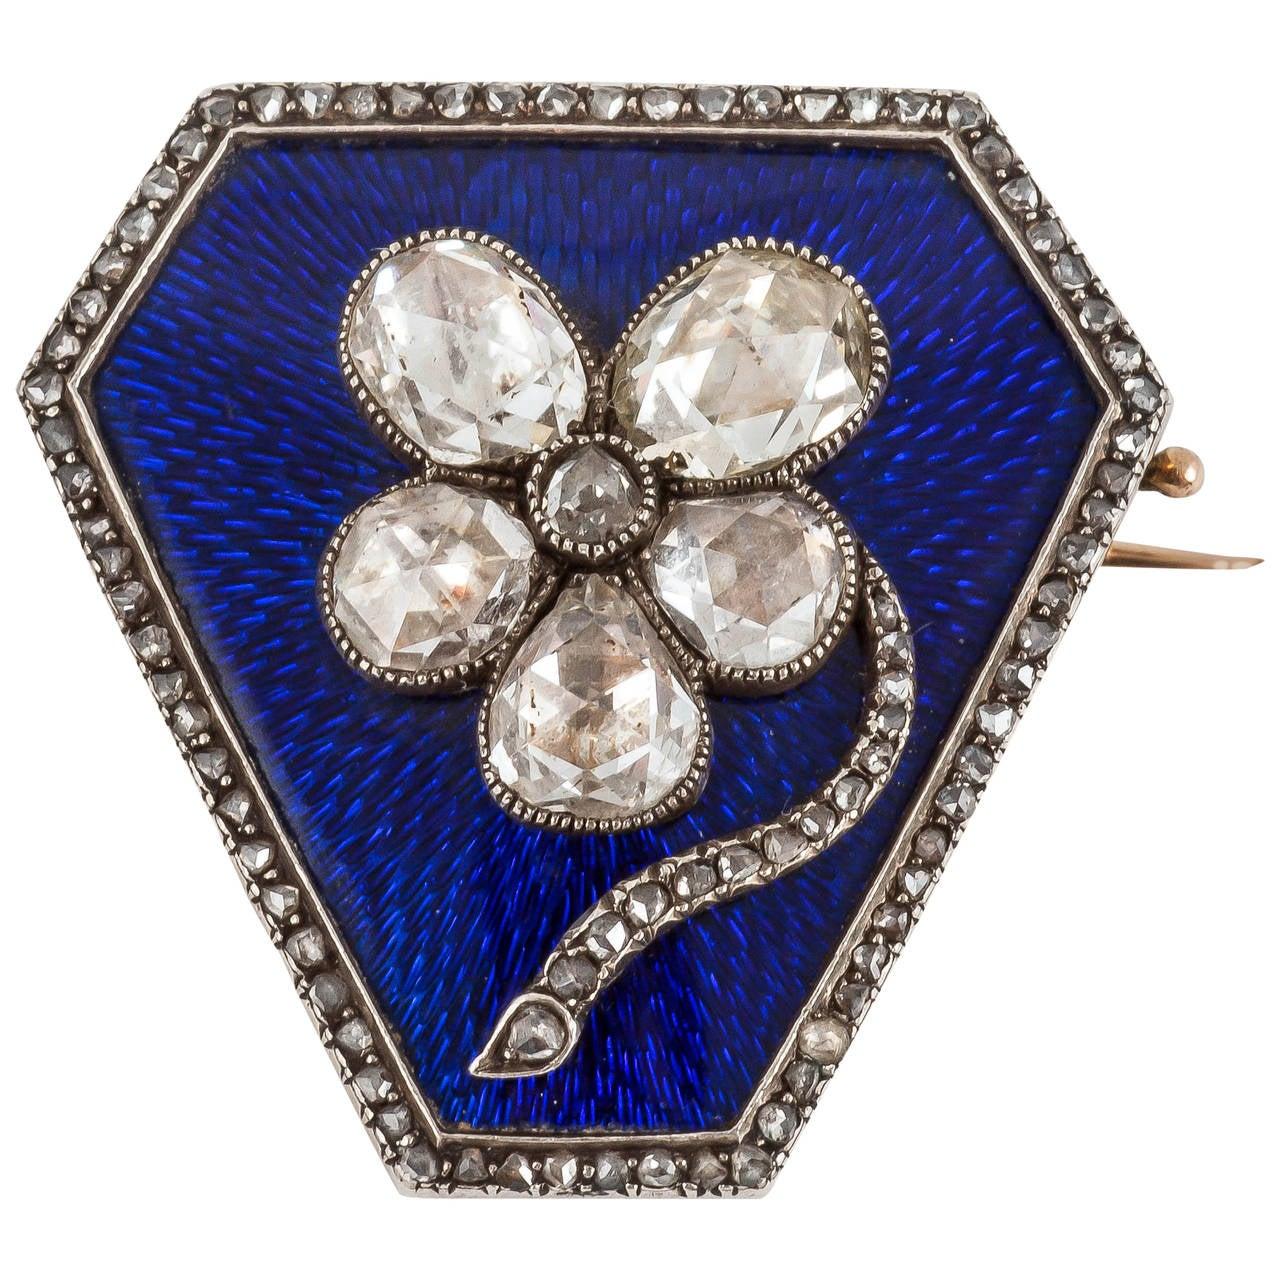 Old Russian enamel and rose cut diamond brooch